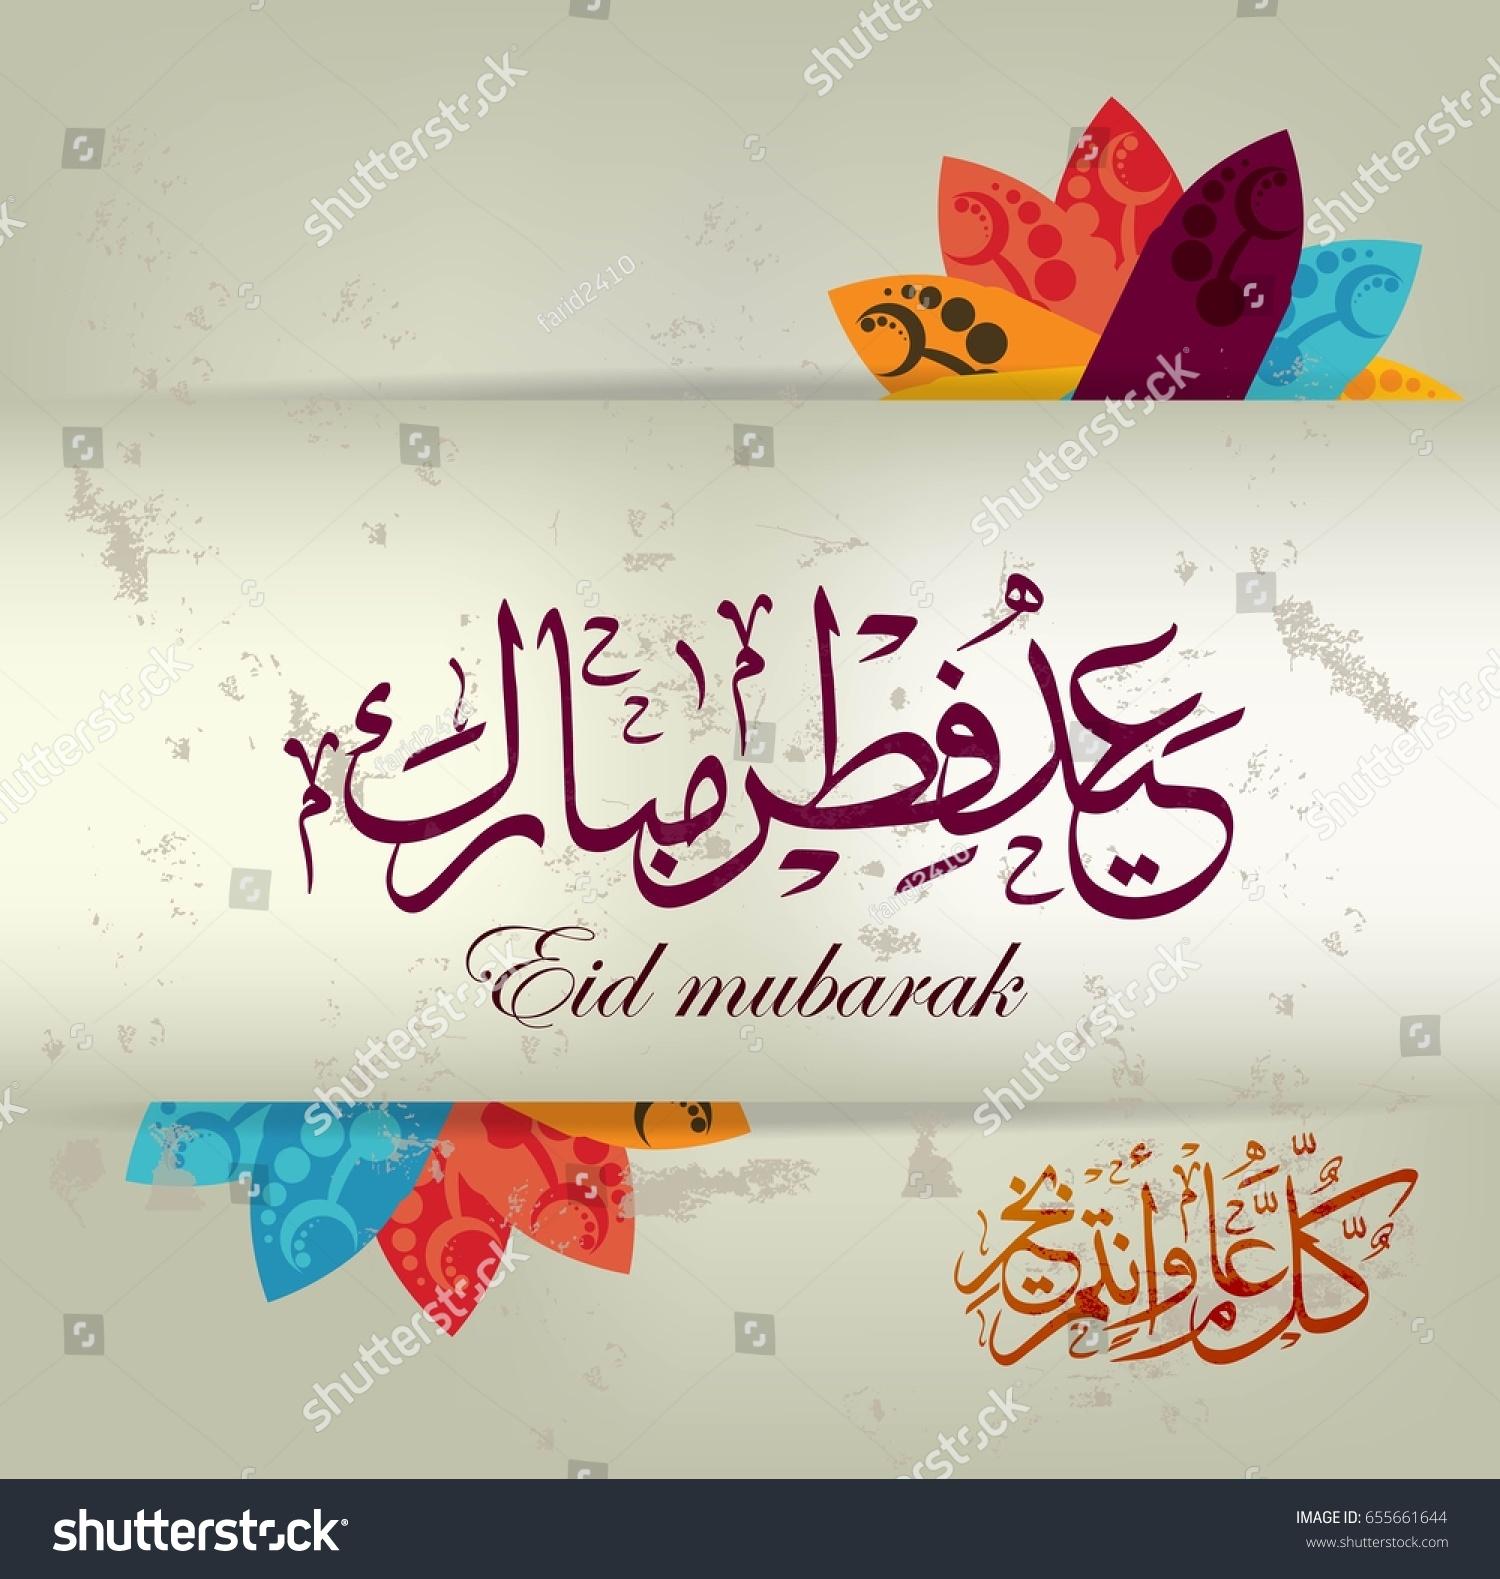 Eid mubarak islamic vector design greeting stock vector 655661644 eid mubarak islamic vector design greeting card template with arabic calligraphy kristyandbryce Gallery